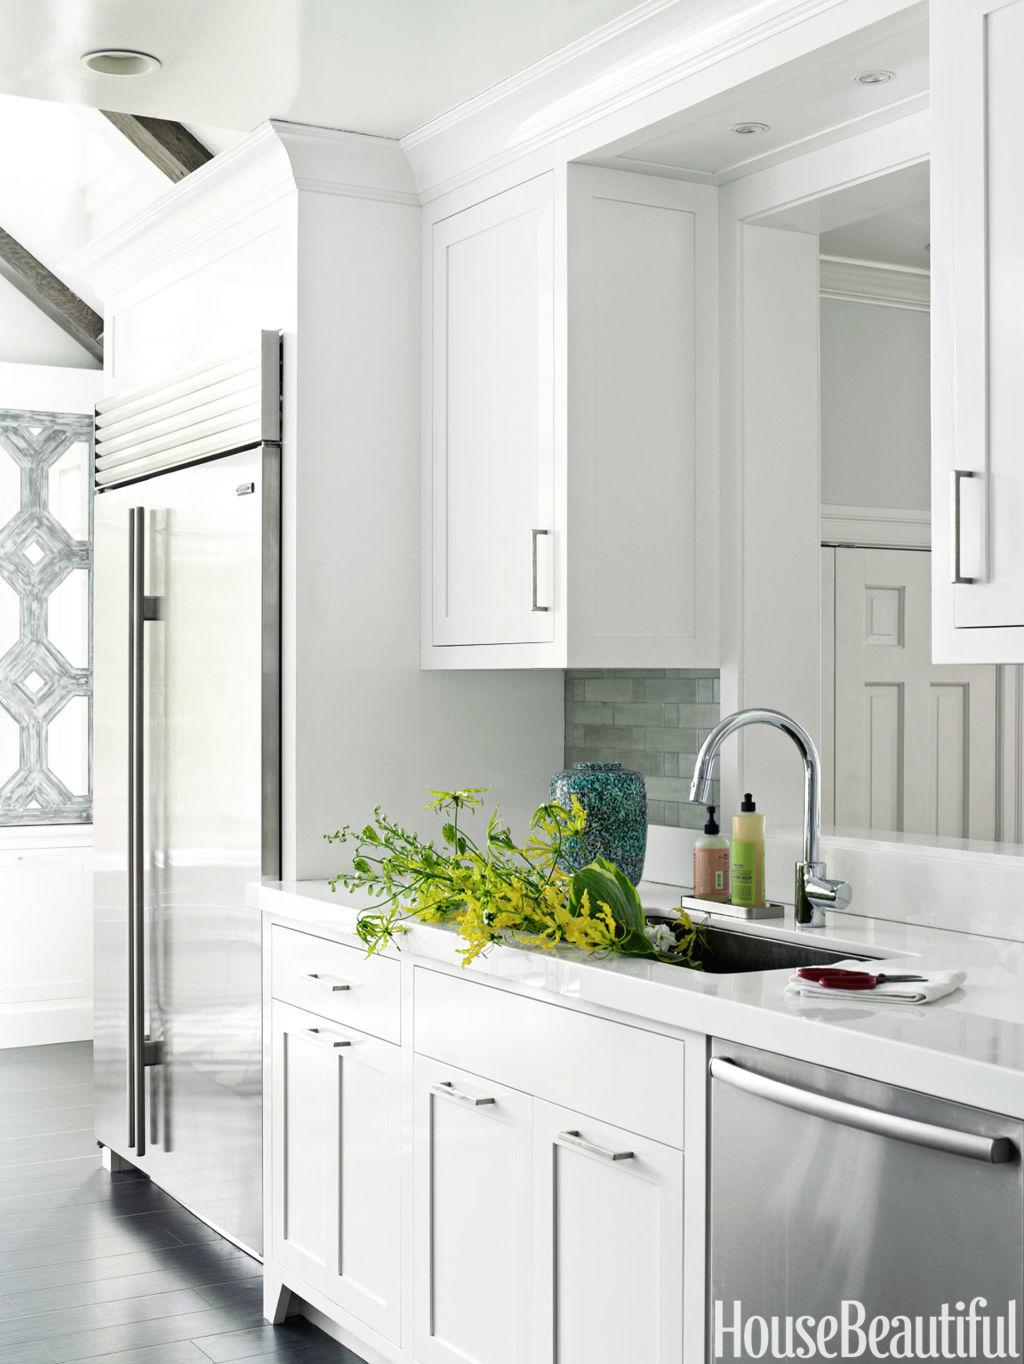 Best Kitchens 2013 : C edaf hbx glossy white kitchen s g